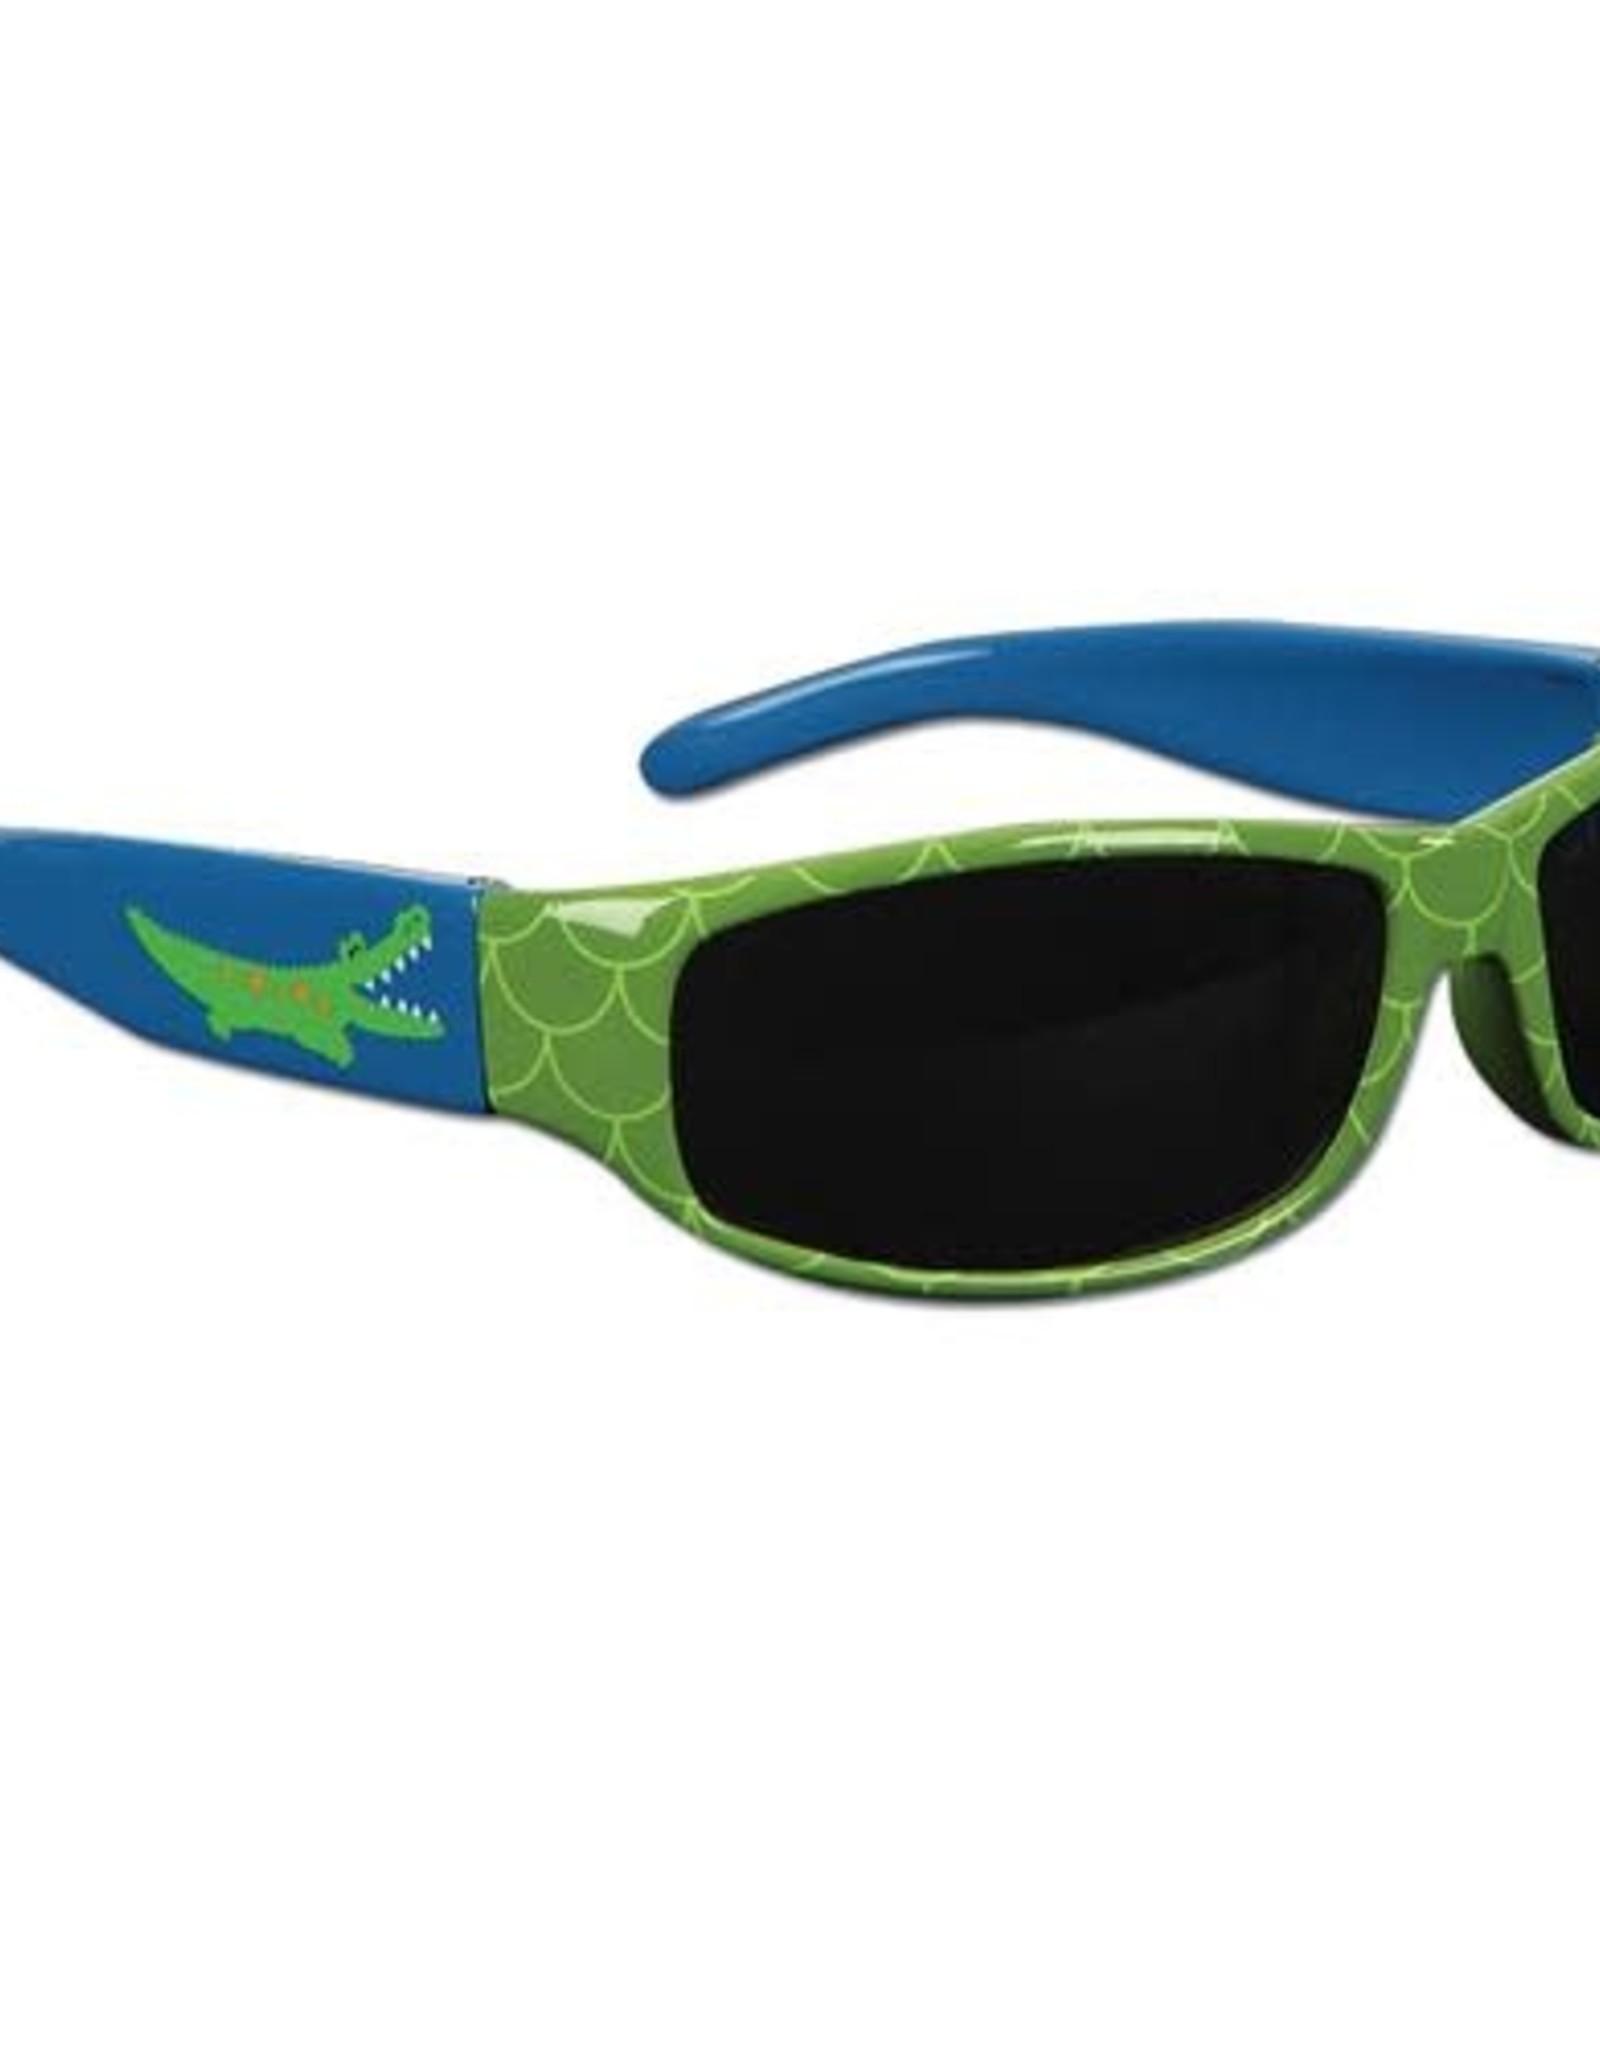 Stephen Joseph Kids Sunglasses - Alligator